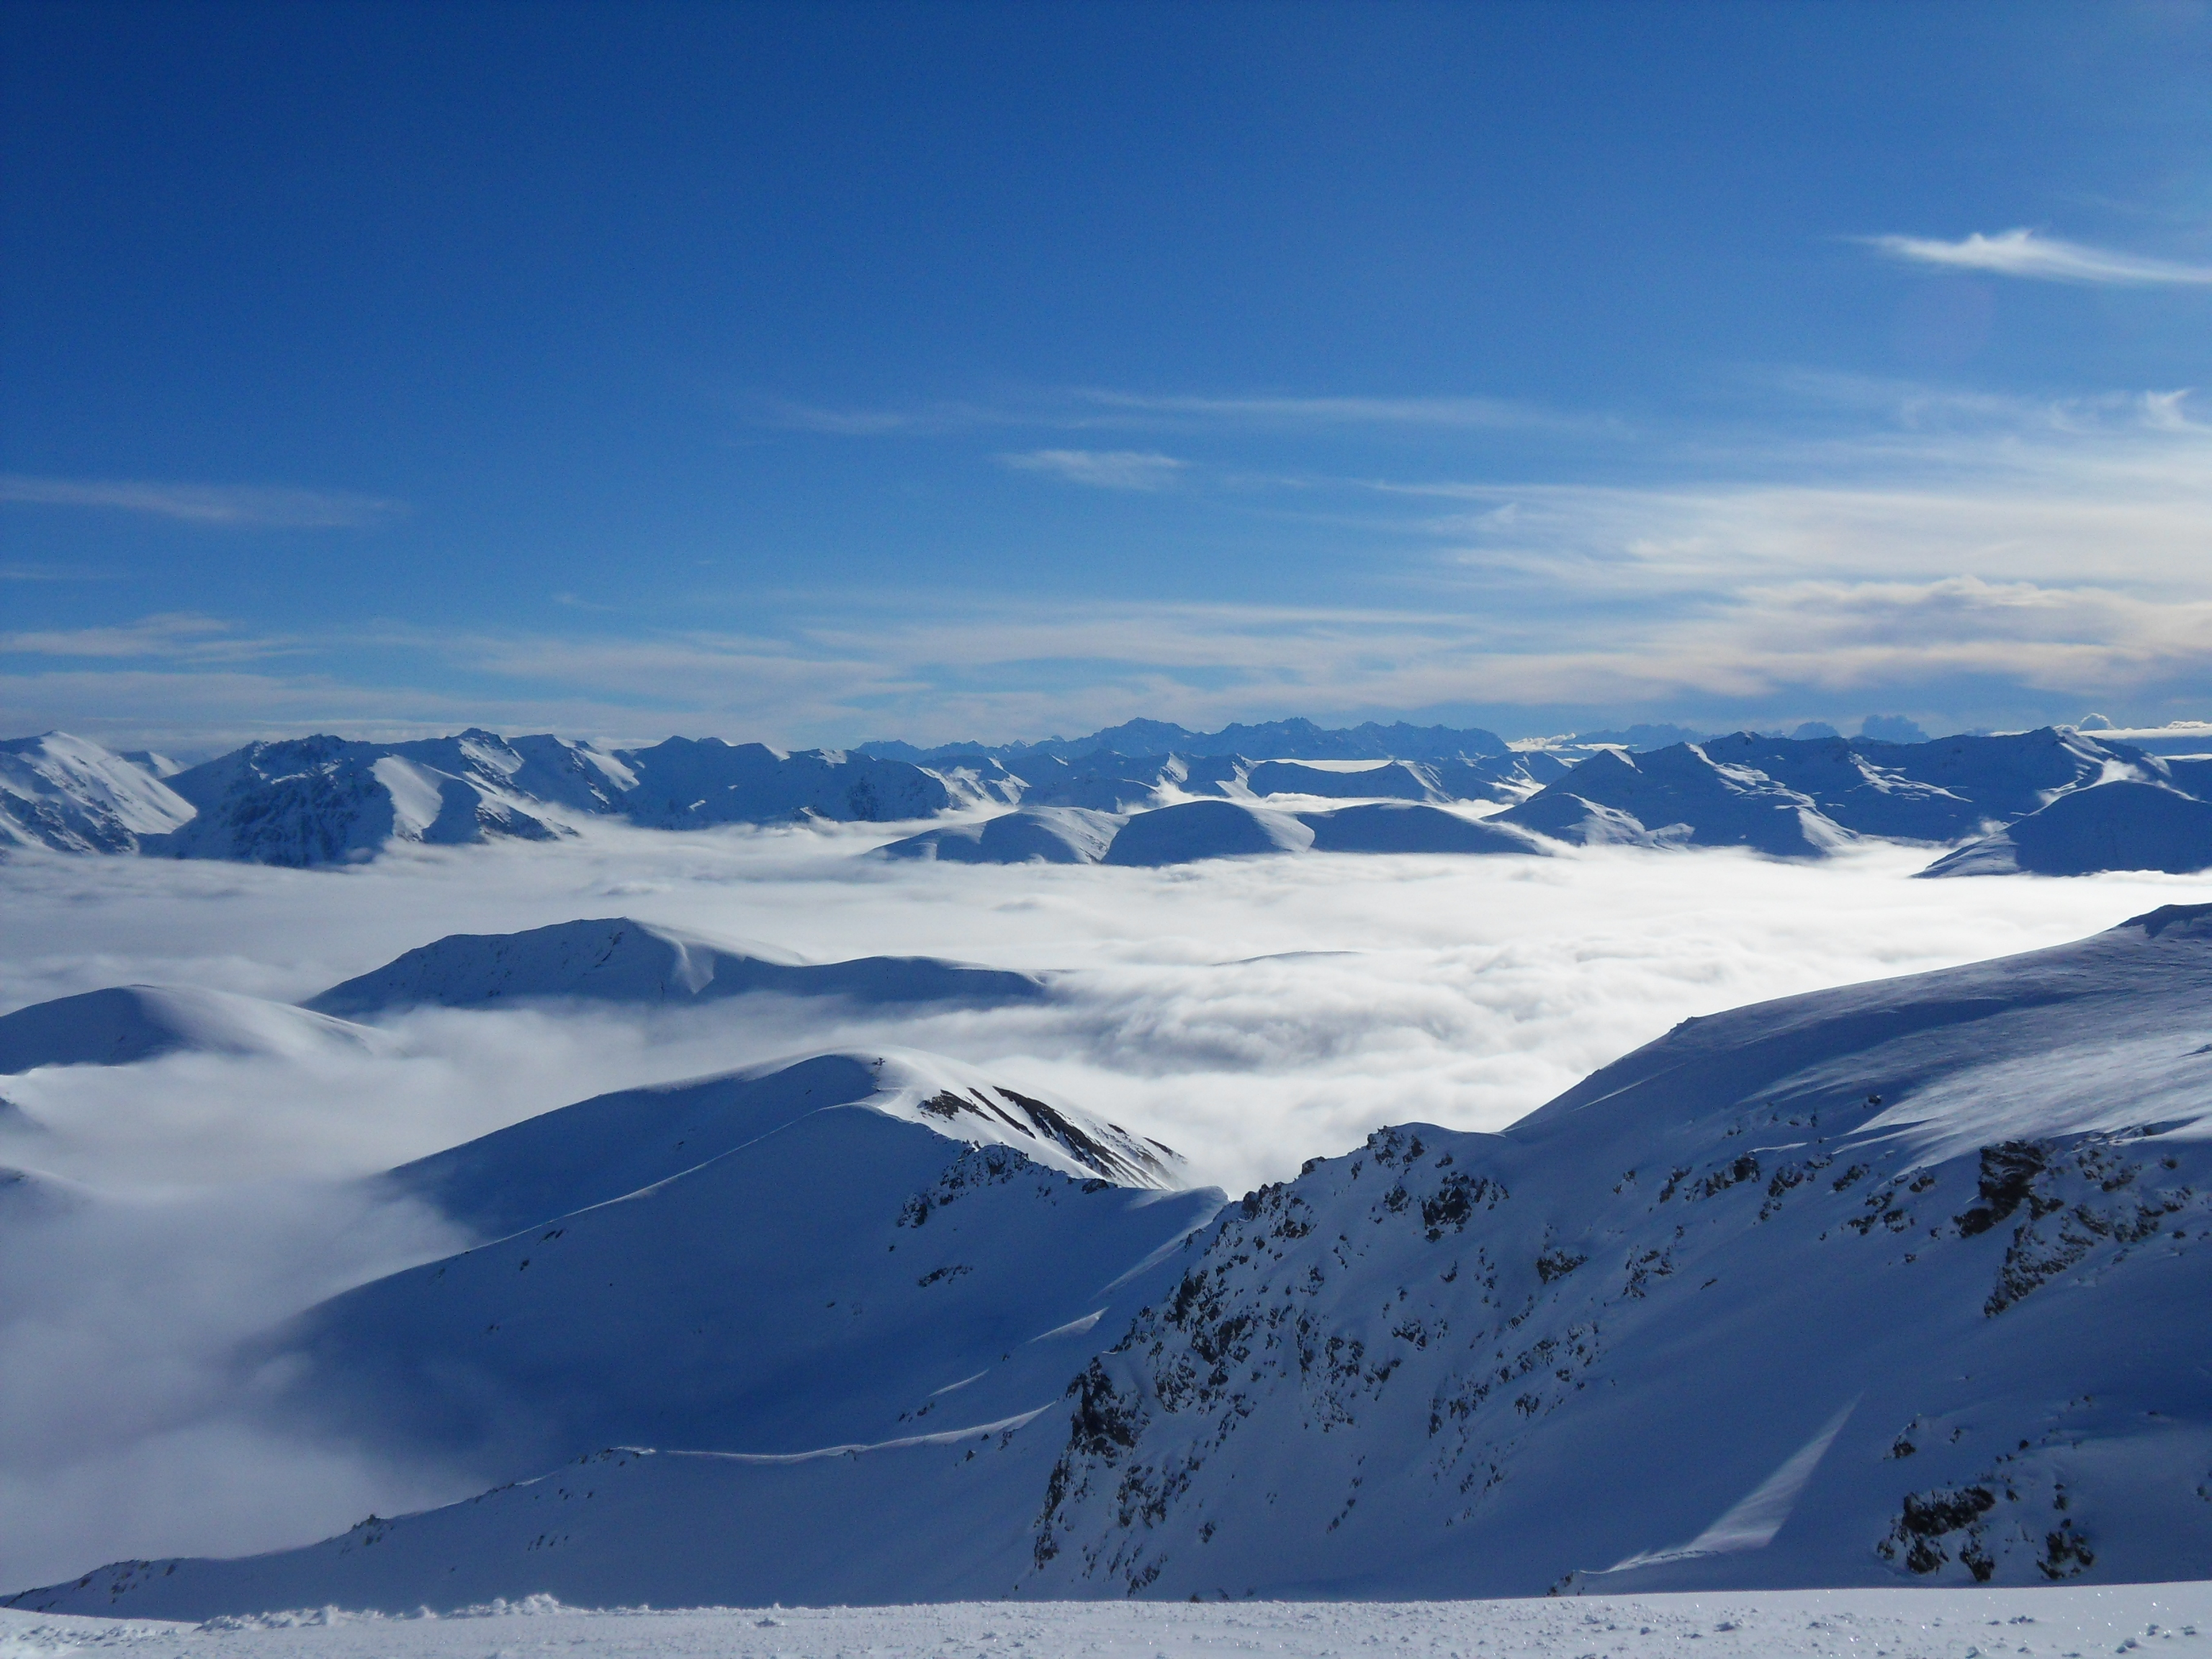 Southern_Alps_from_Mt_Hutt%2C_NZ2.jpg